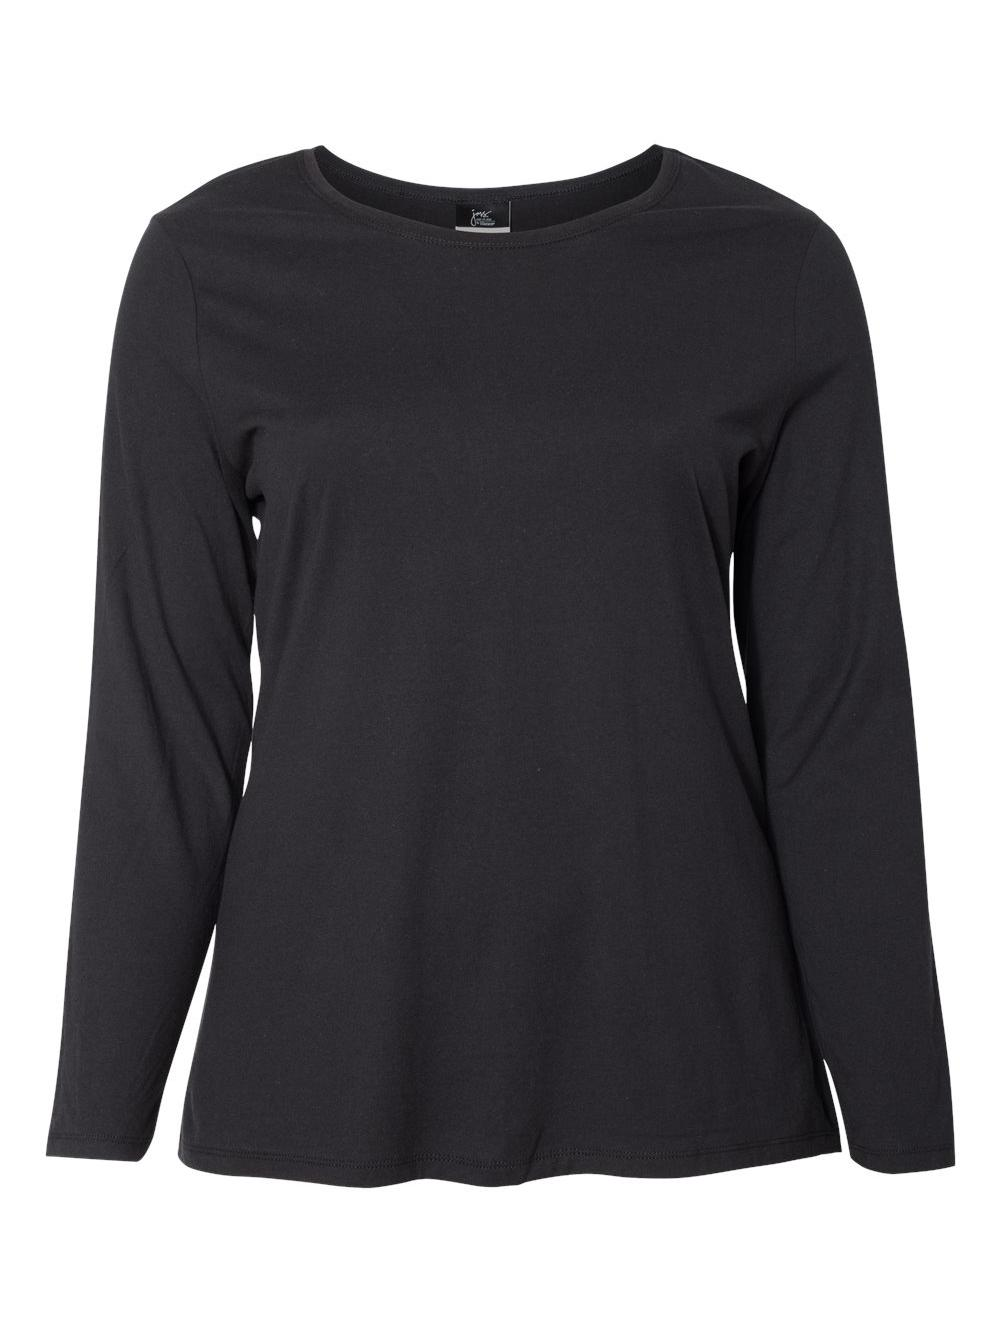 Just-My-Size-Women-039-s-Long-Sleeve-T-Shirt-JMS40 thumbnail 3